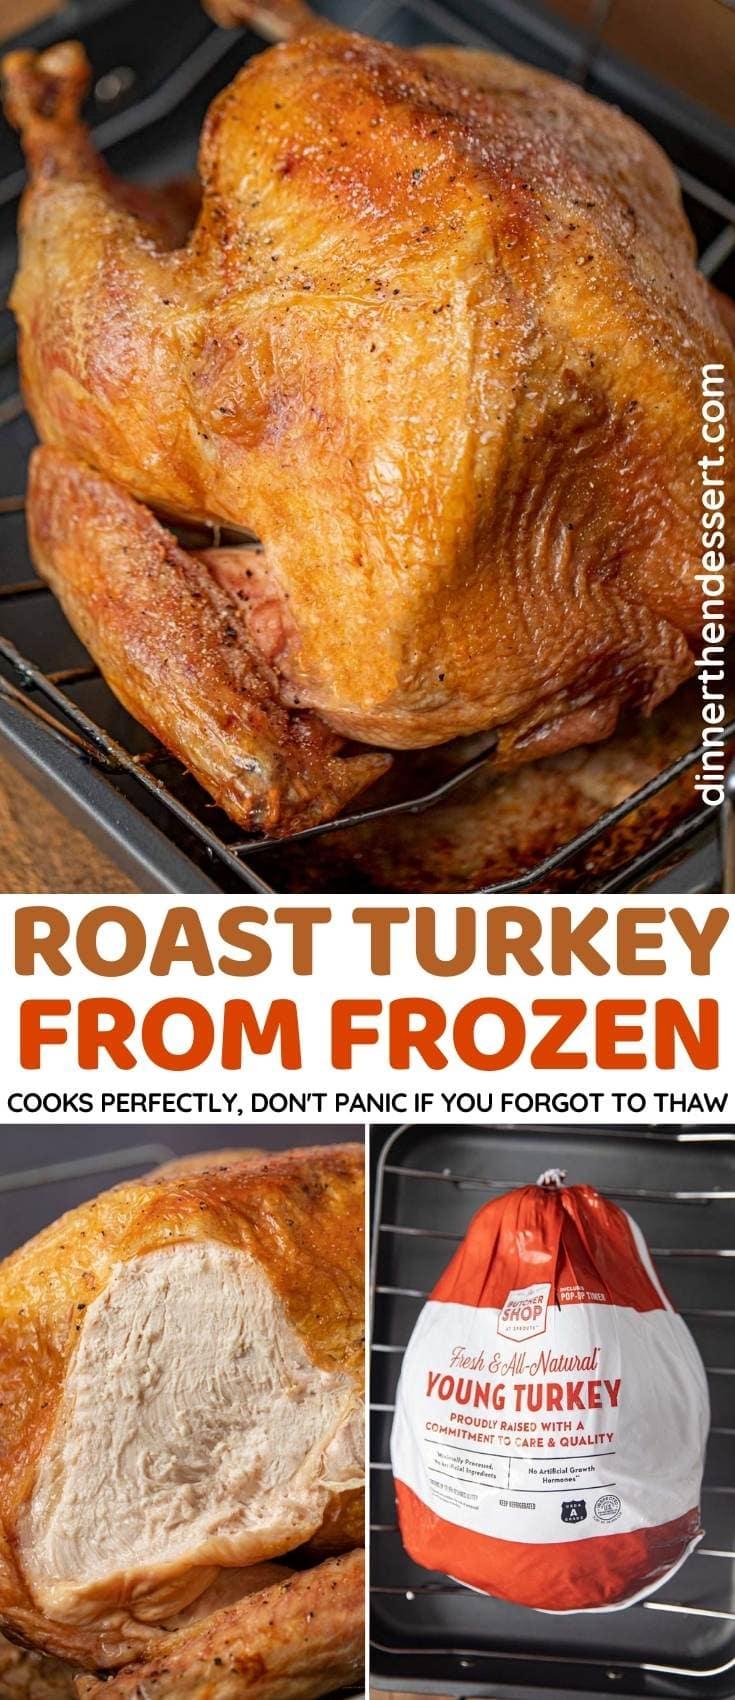 Roast Turkey from Frozen collage